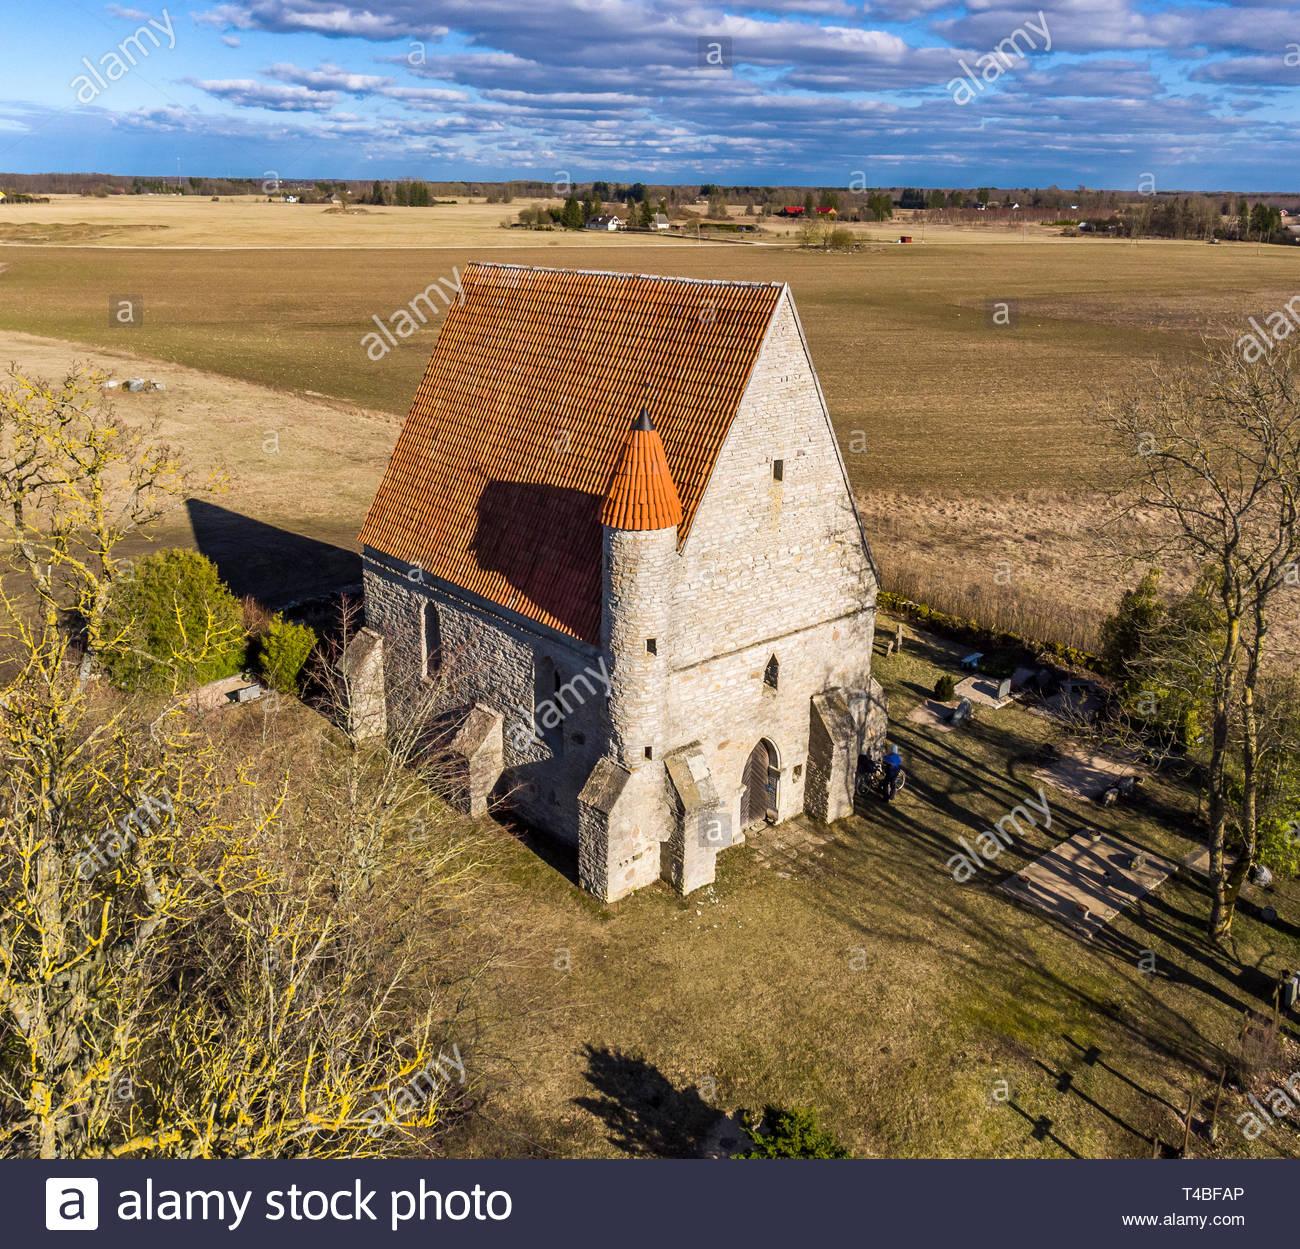 Saha Loo ( Saha-Loo ) medieval Chapel in Harju county, Estonia, near Tallinn. The present building dates from the early 15th century. - Stock Image